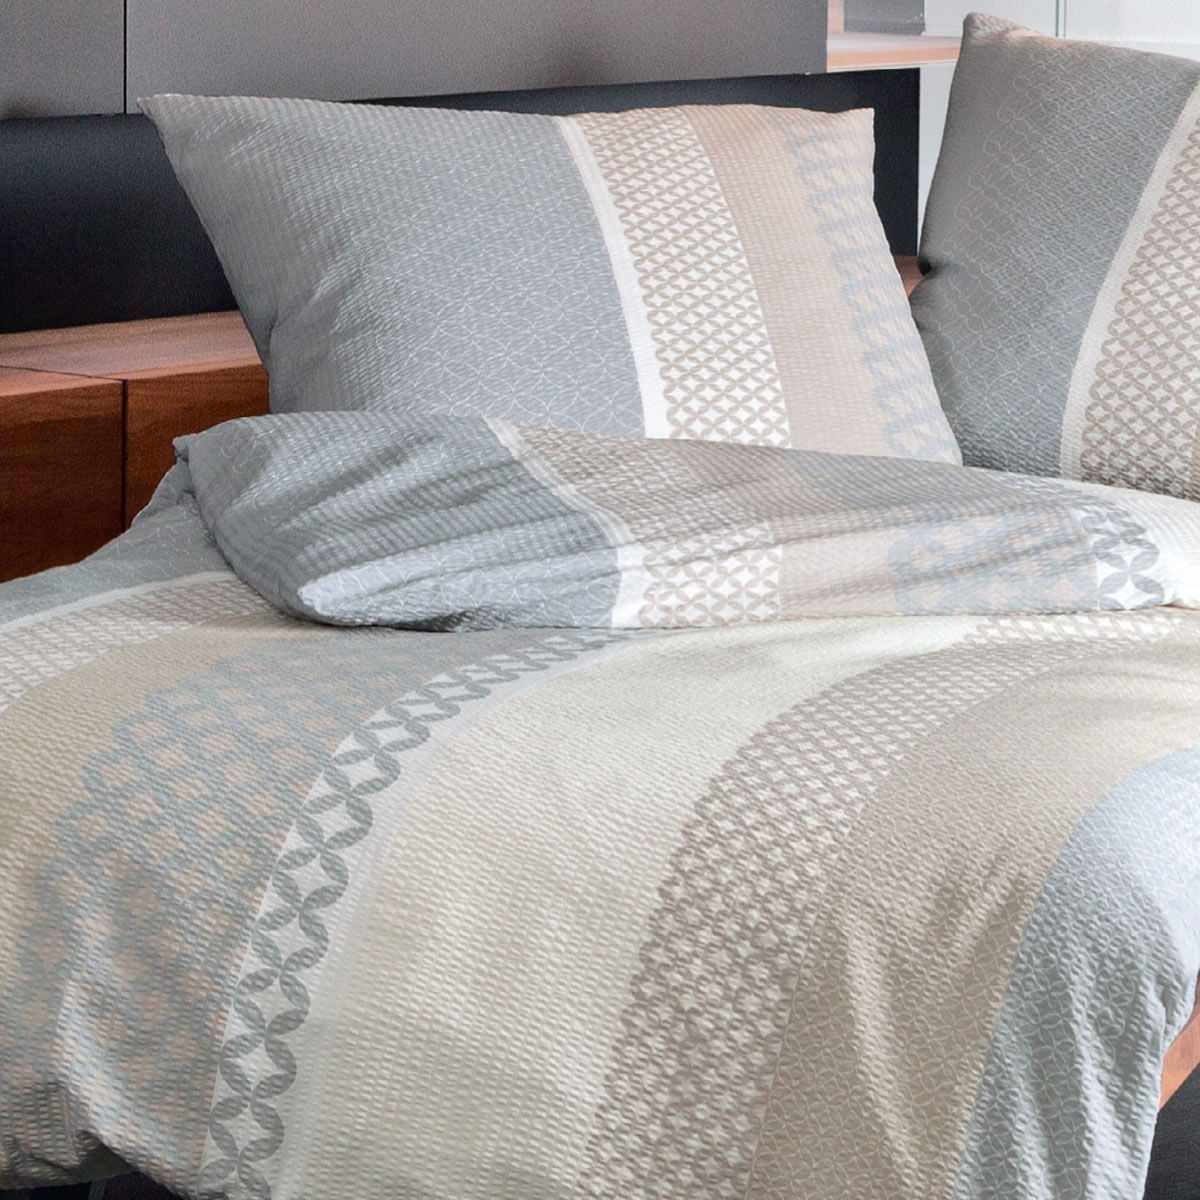 janine mako soft seersucker bettw sche in 135x200 cm 1b ware 20043 07. Black Bedroom Furniture Sets. Home Design Ideas